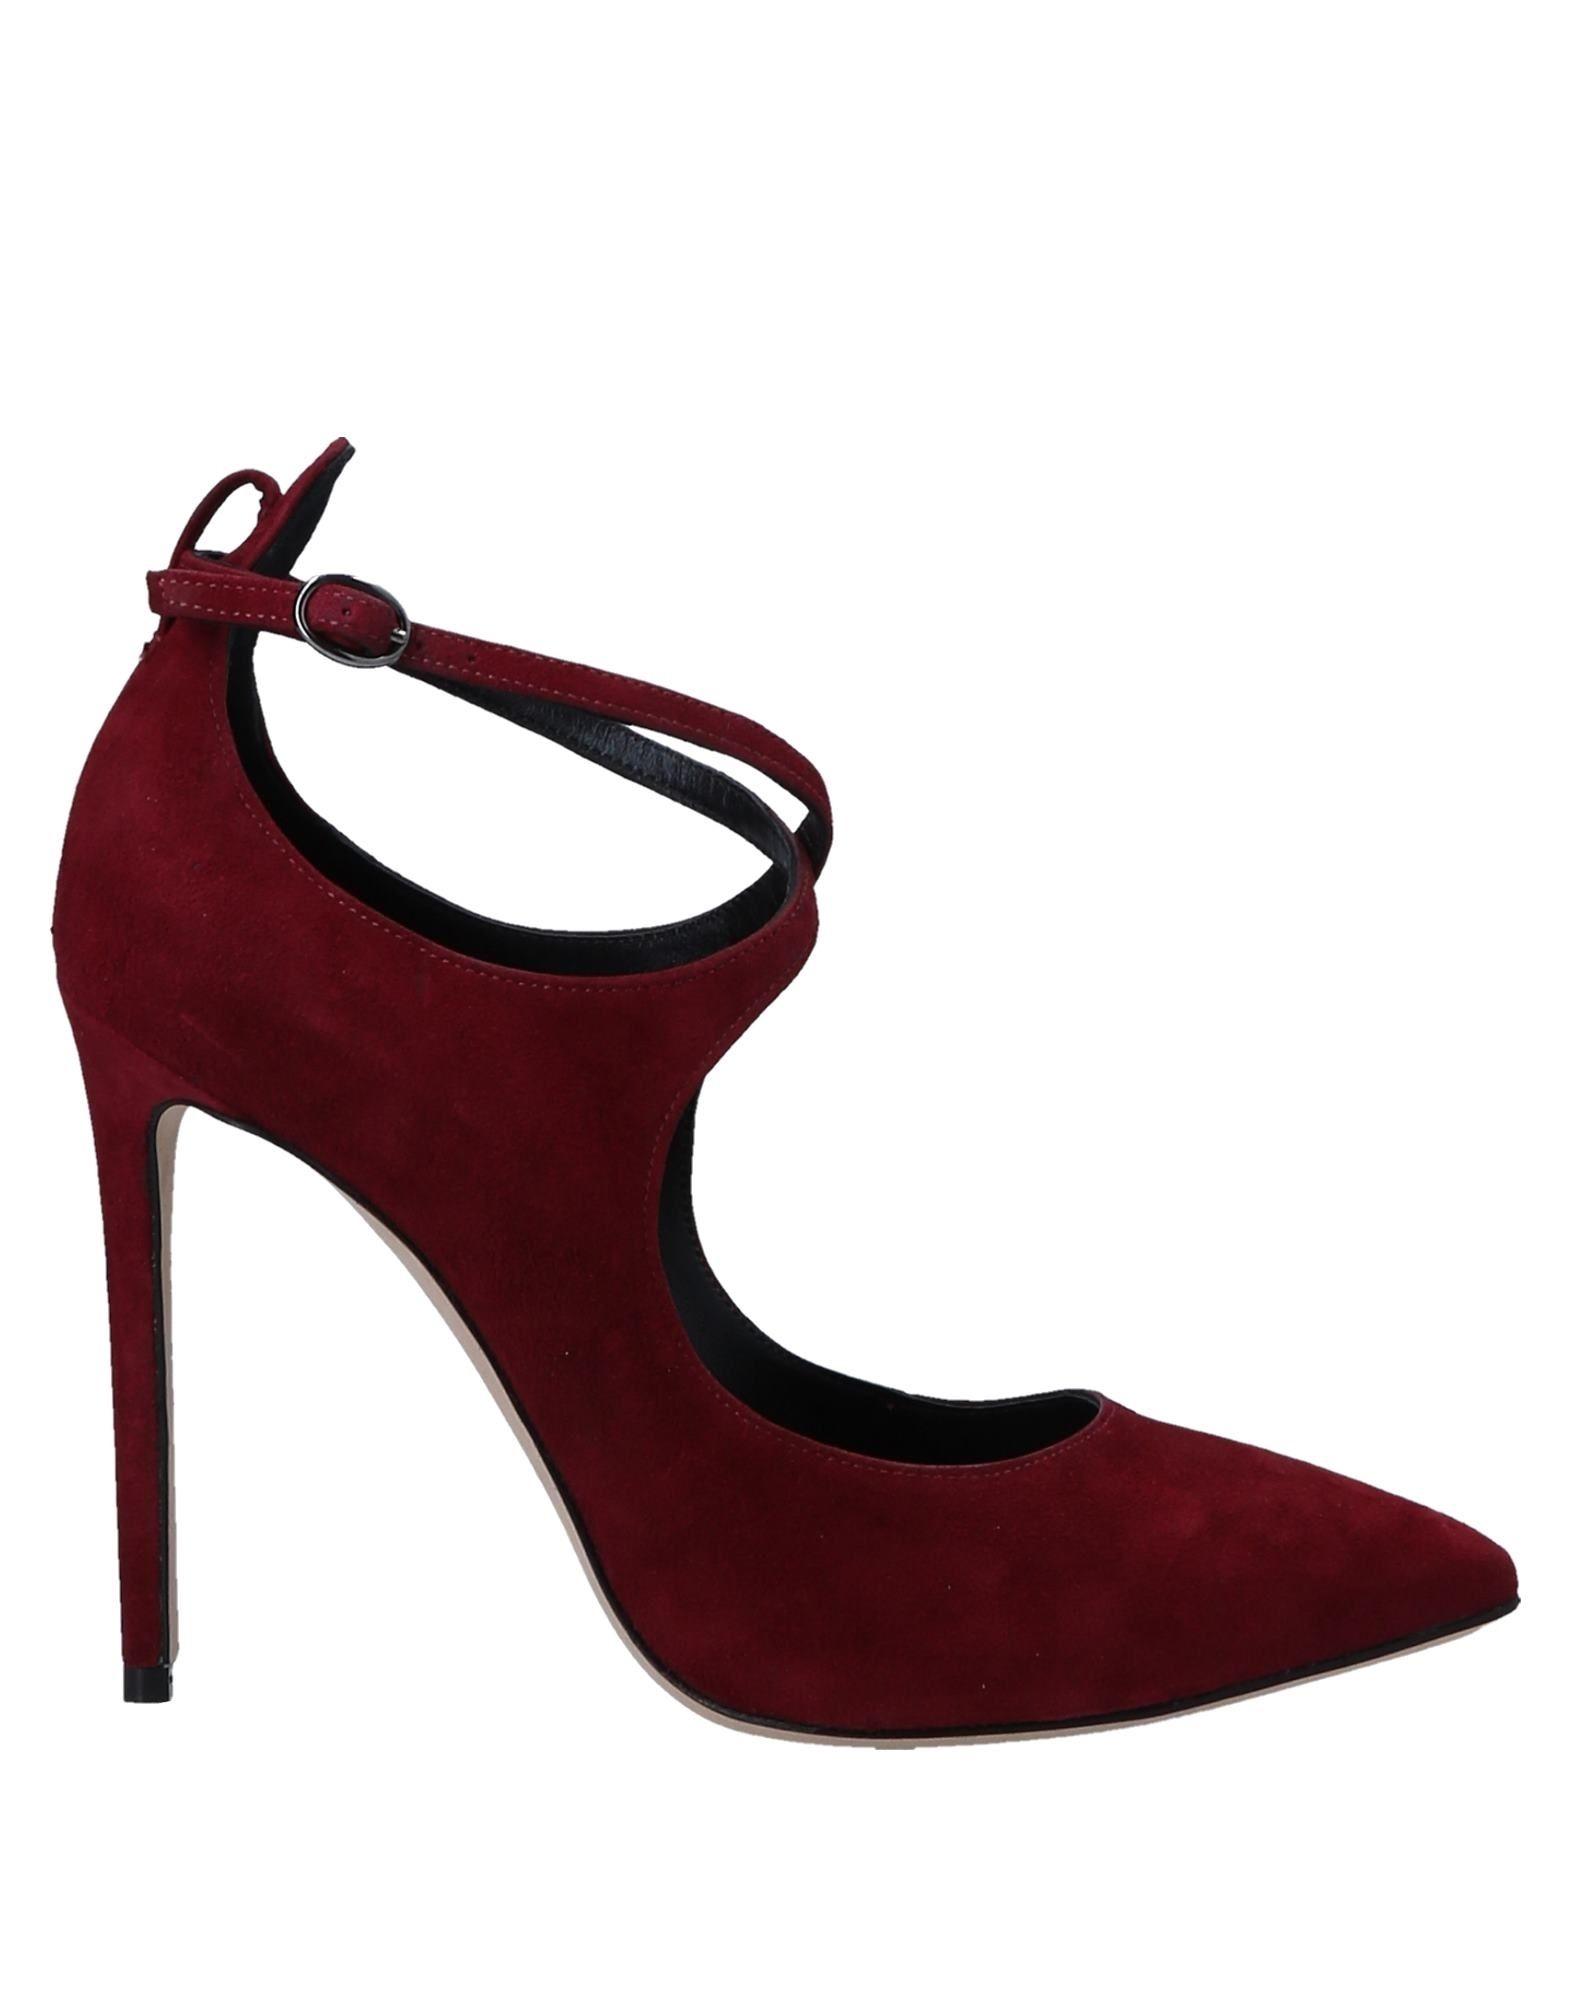 Gut um billige Schuhe Damen zu tragenMarc Ellis Pumps Damen Schuhe  11563539KQ 5ca122